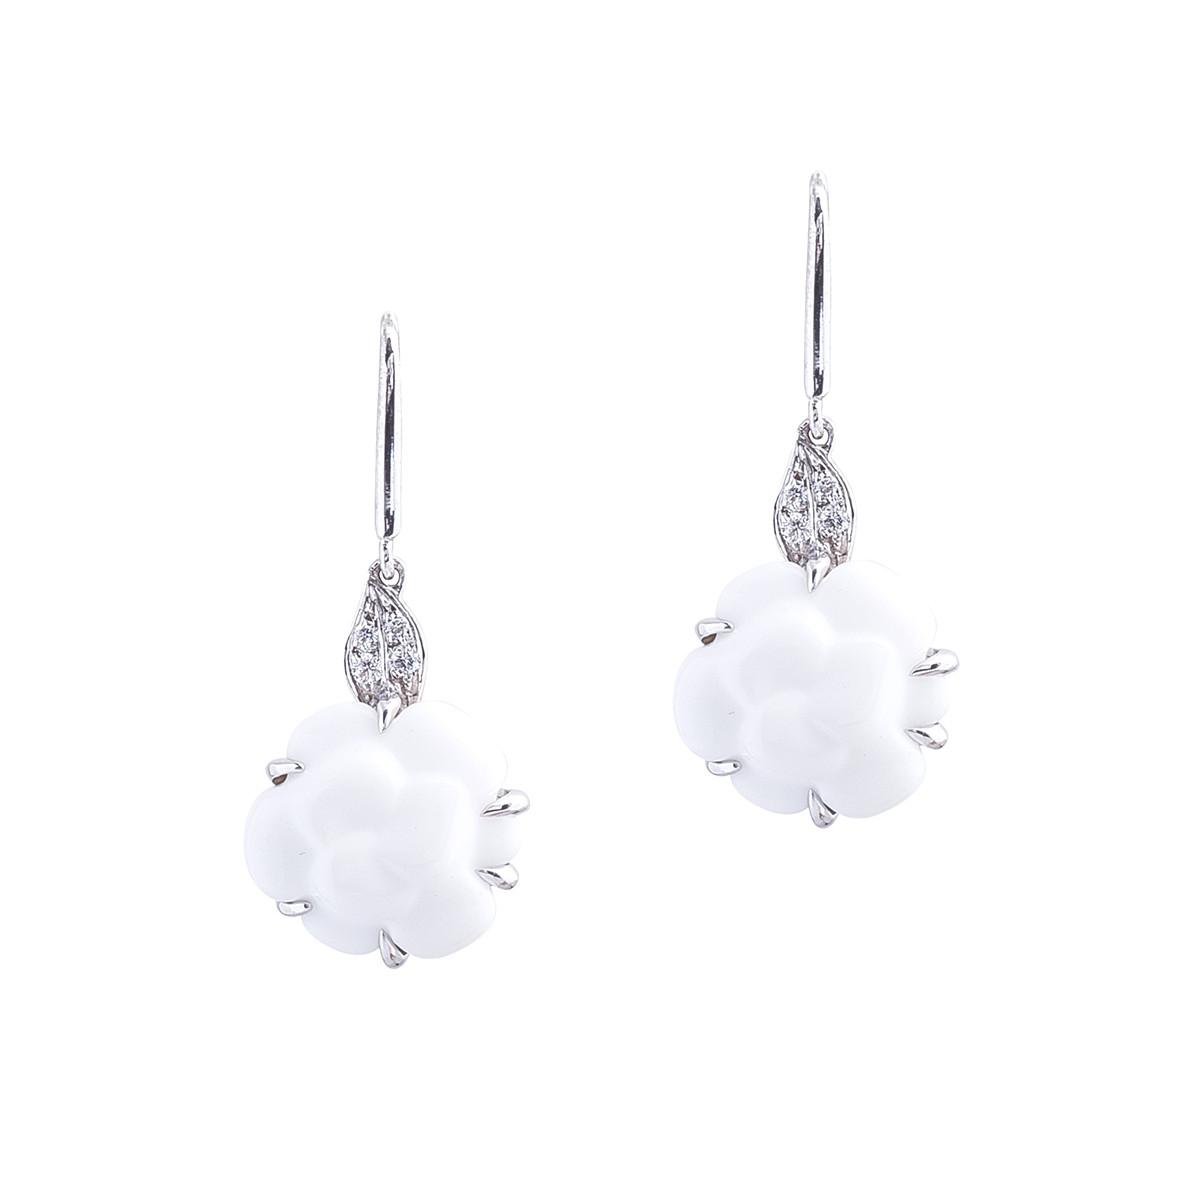 Vintage Chanel Camelia White Agate Diamond Dangle Earrings Gallery Image